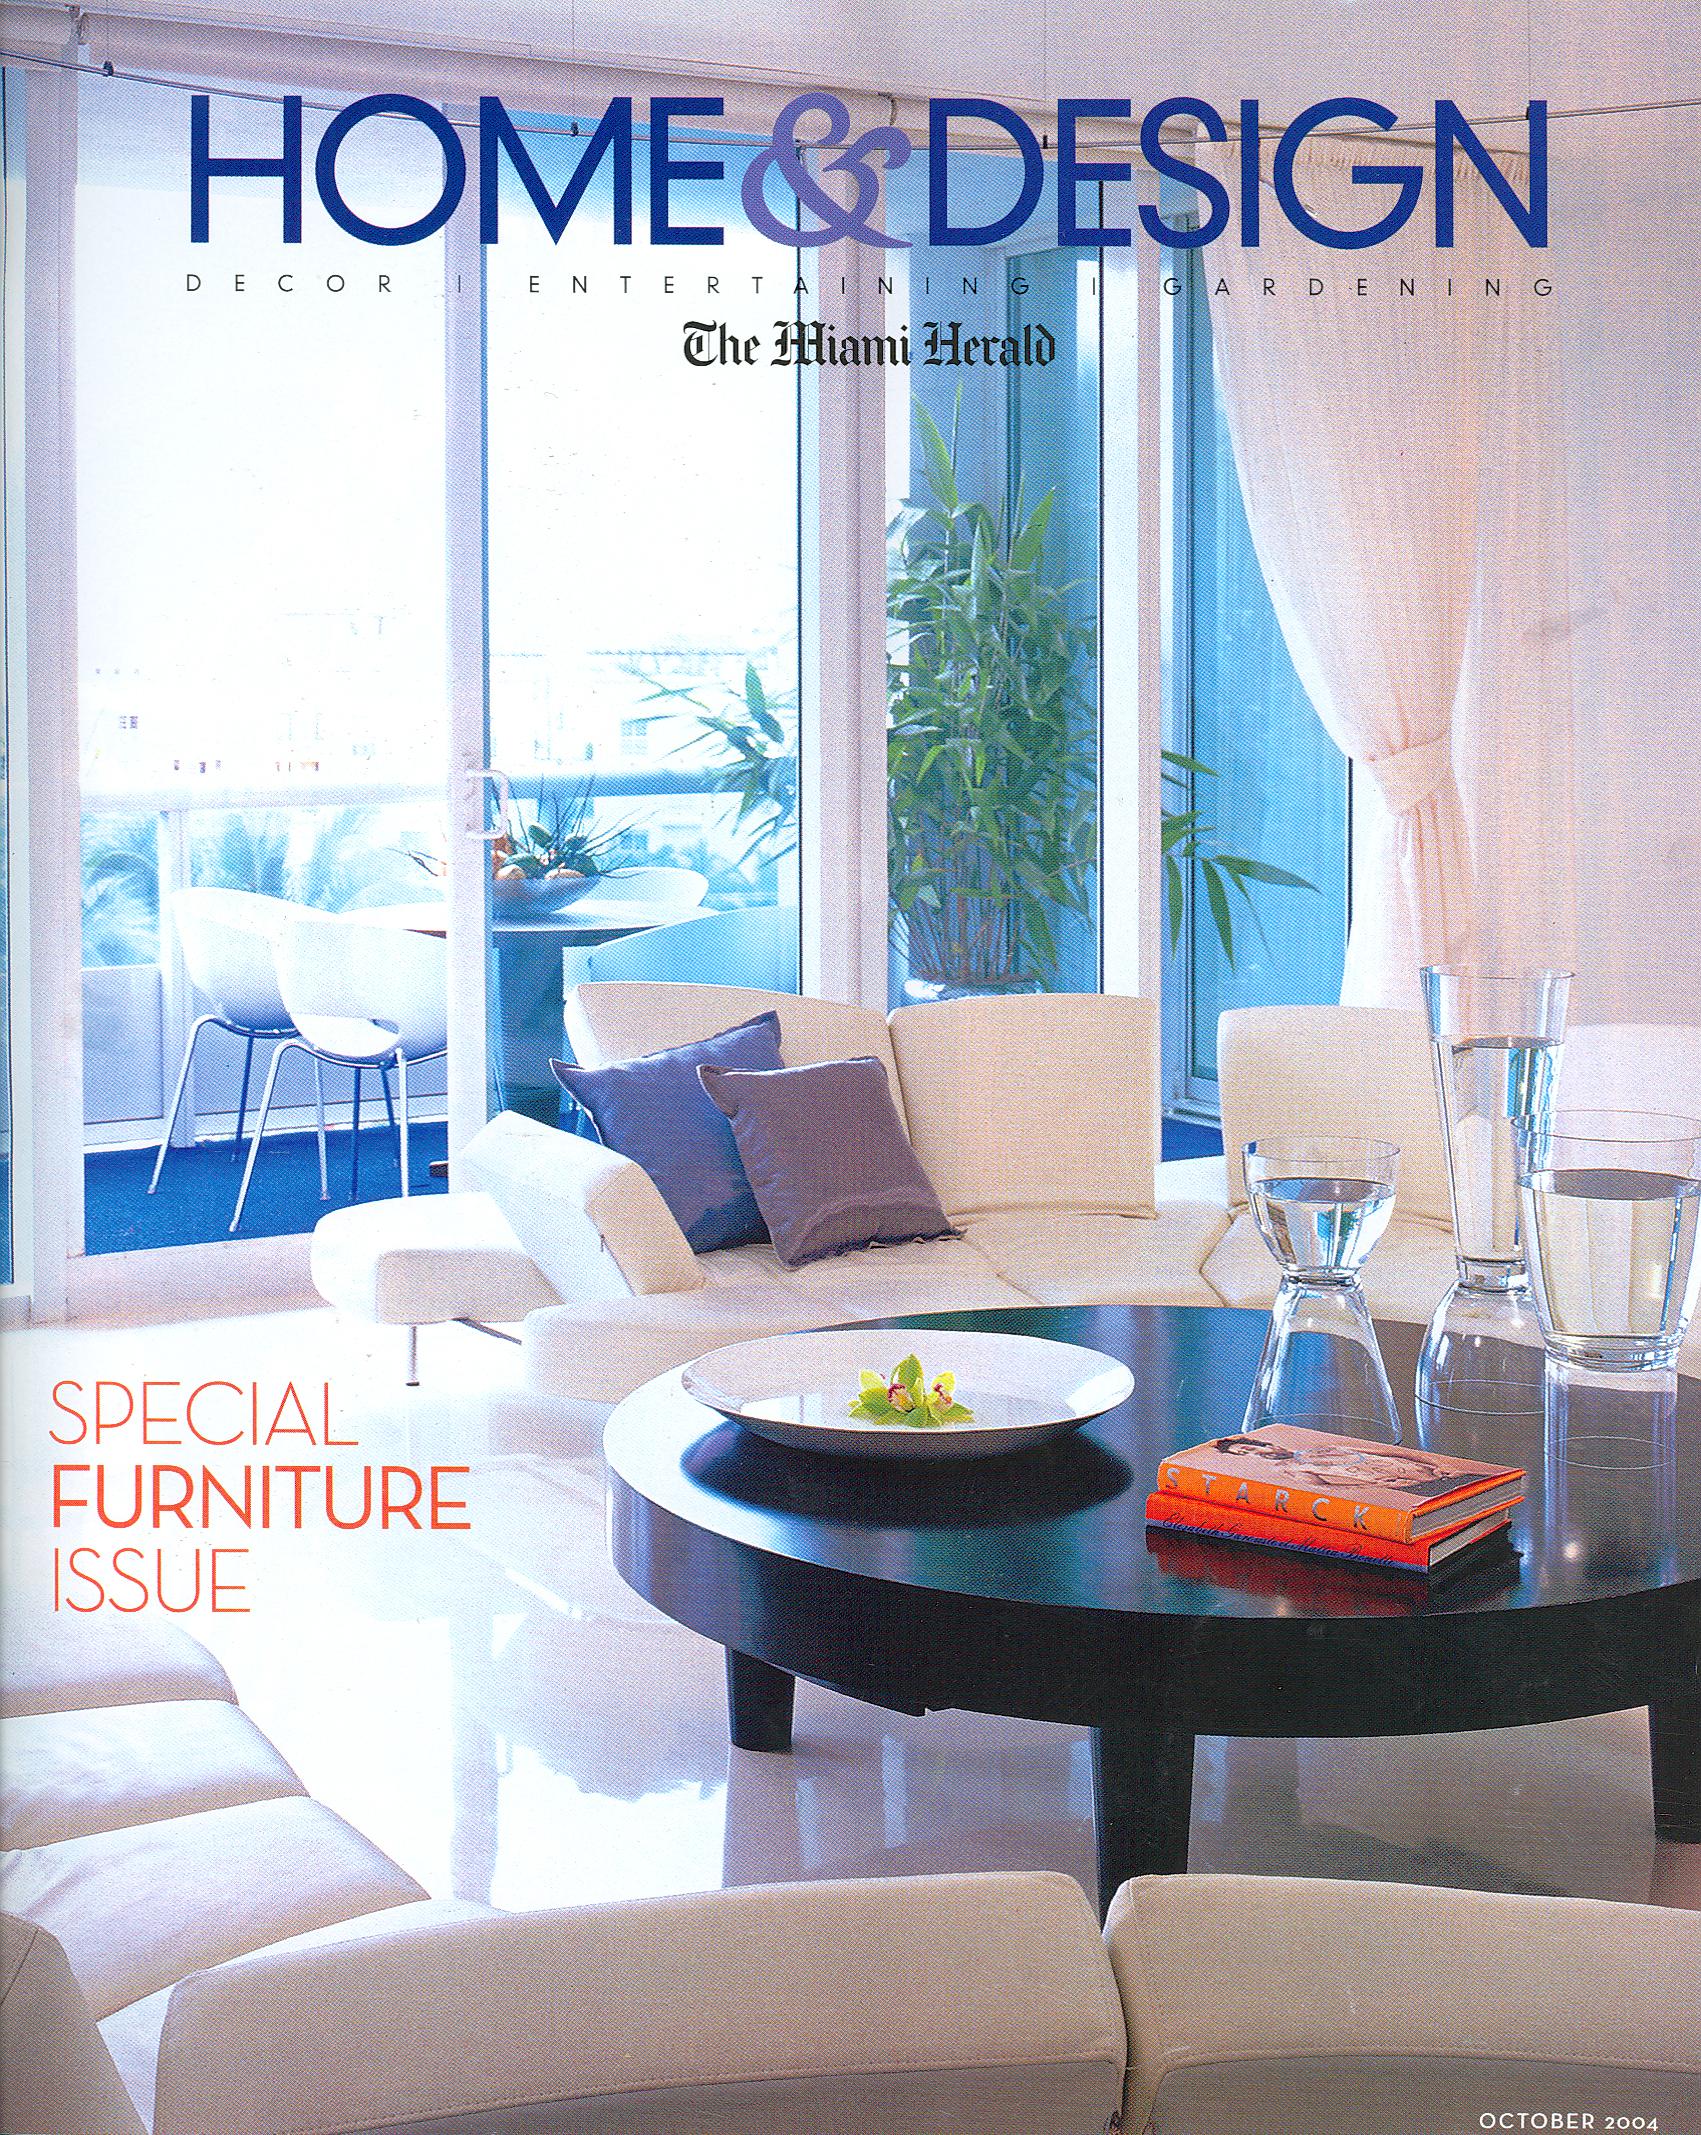 Home&Design section October2004cover.jpg